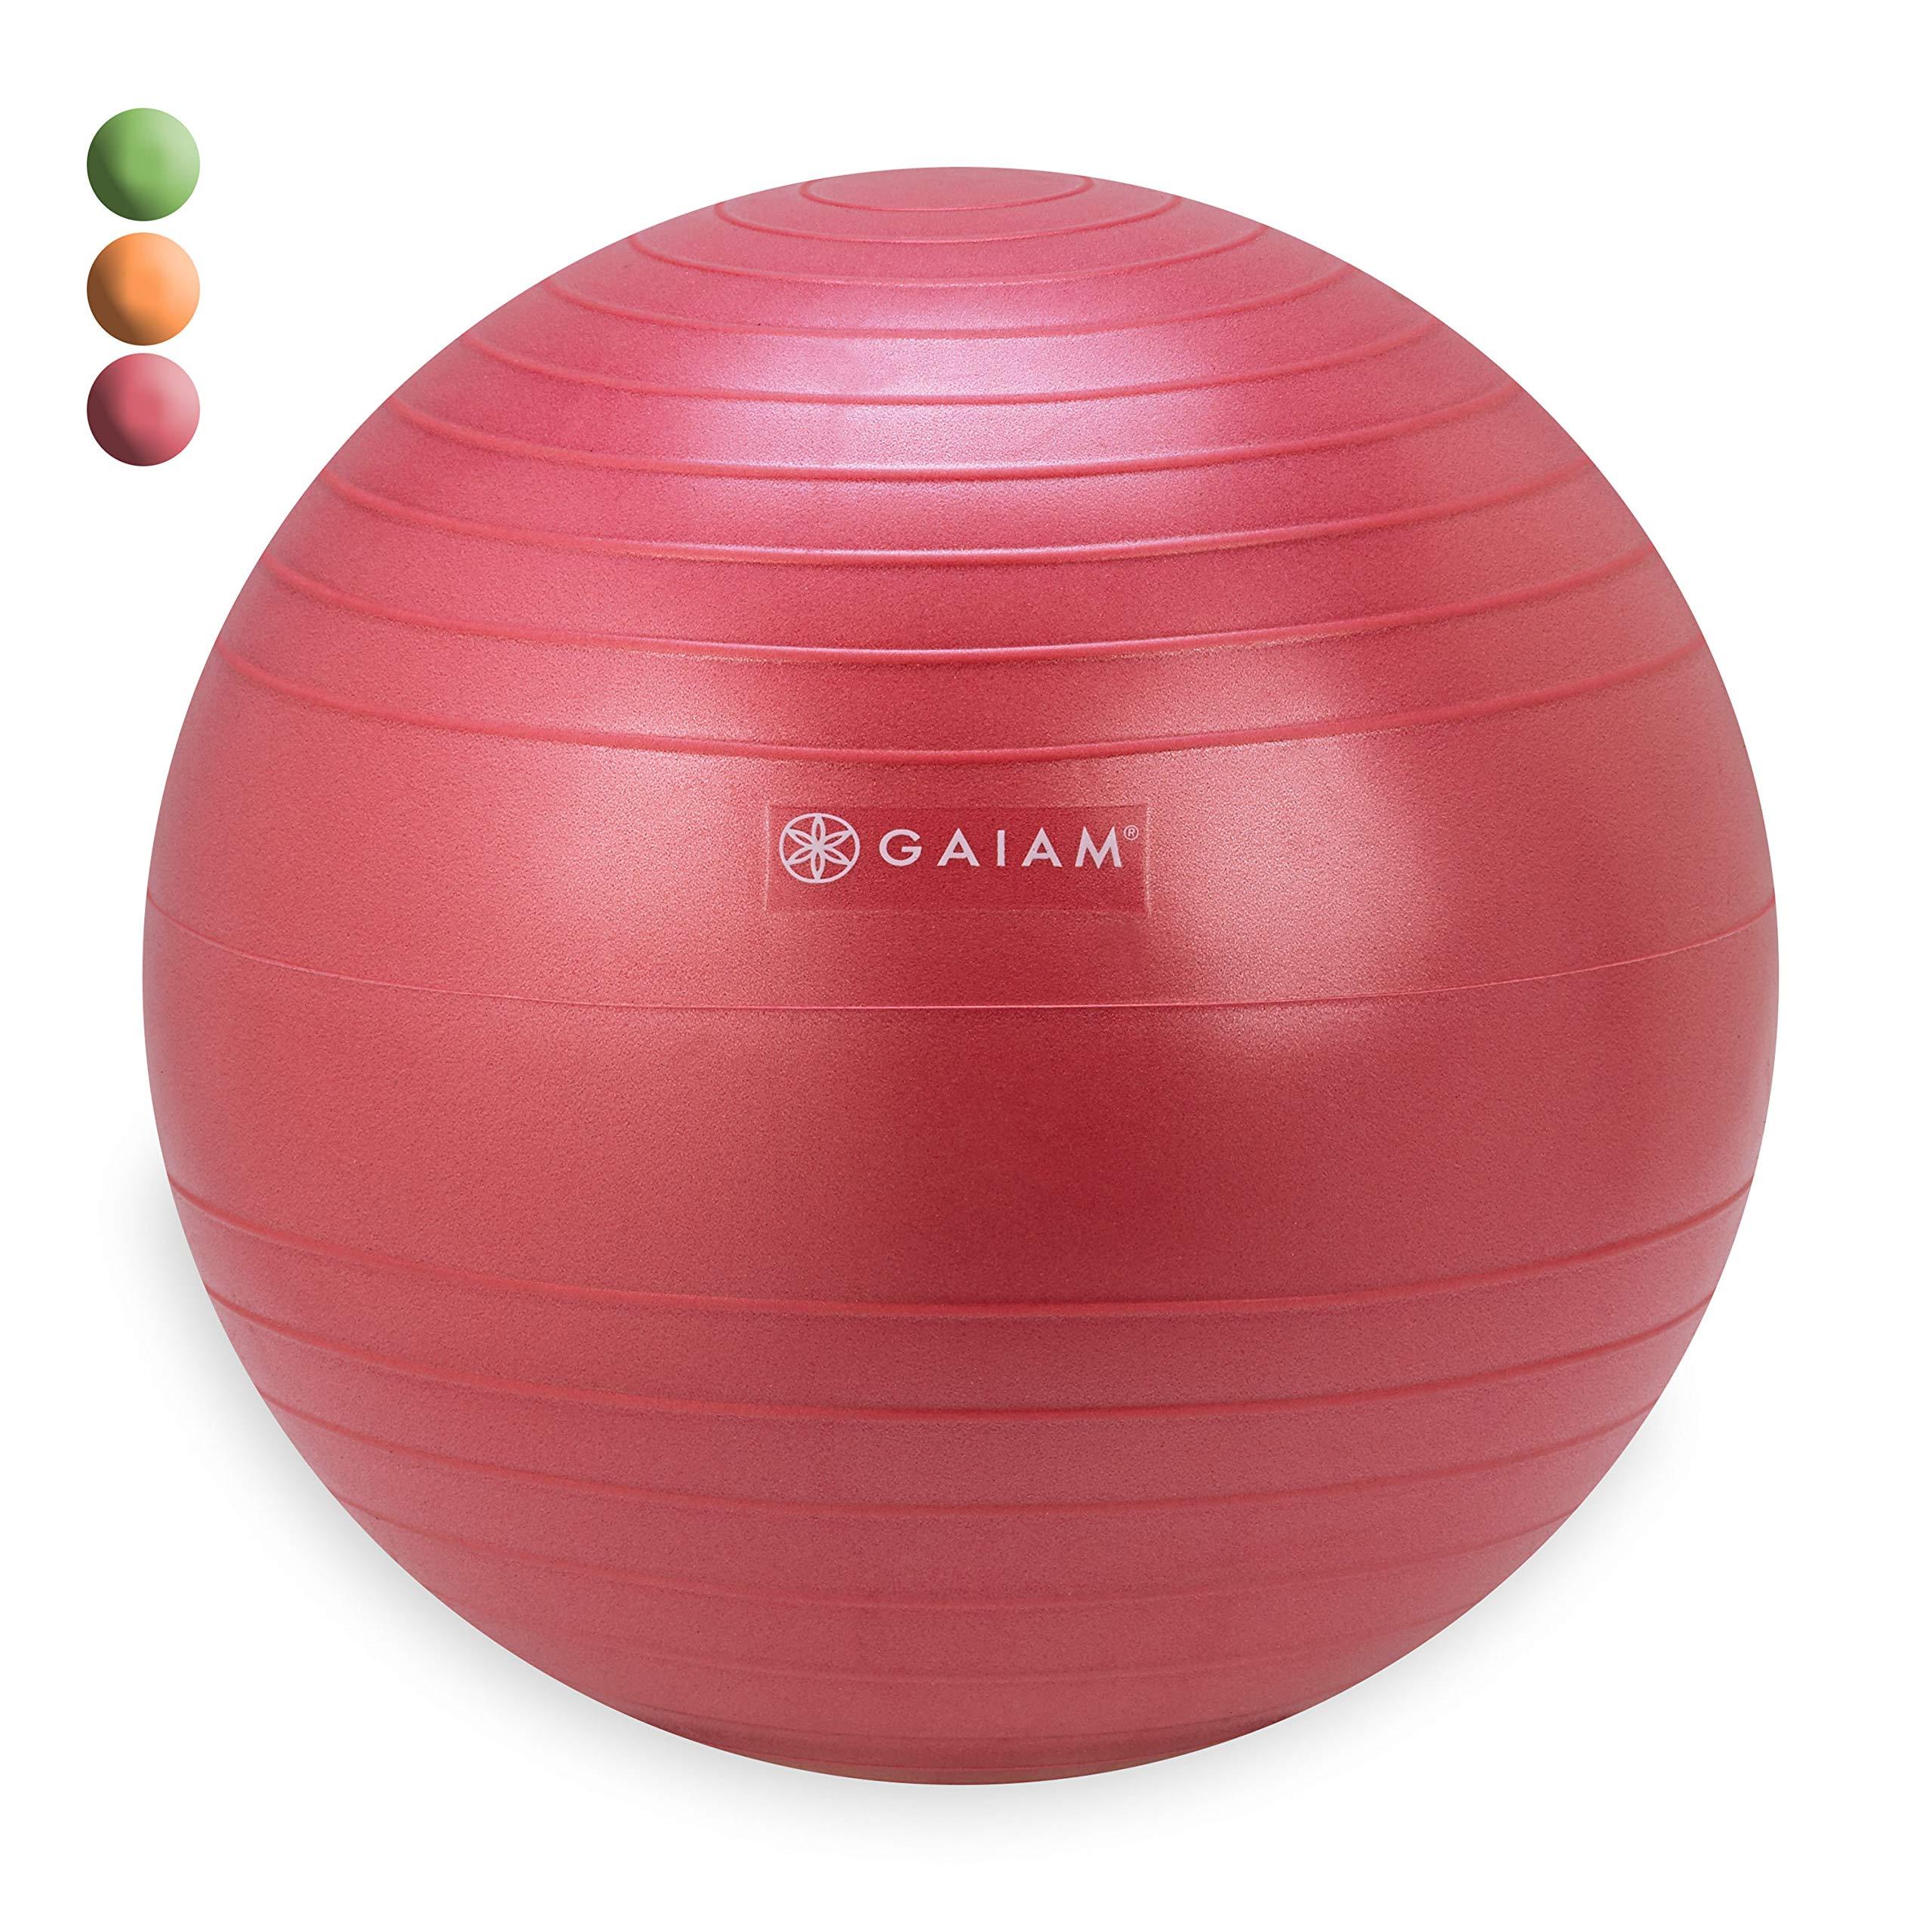 Gaiam Kids Balance Ball Chair Ball - Extra Balance Ball for Kids Balance Ball Chair, Pink, 38cm